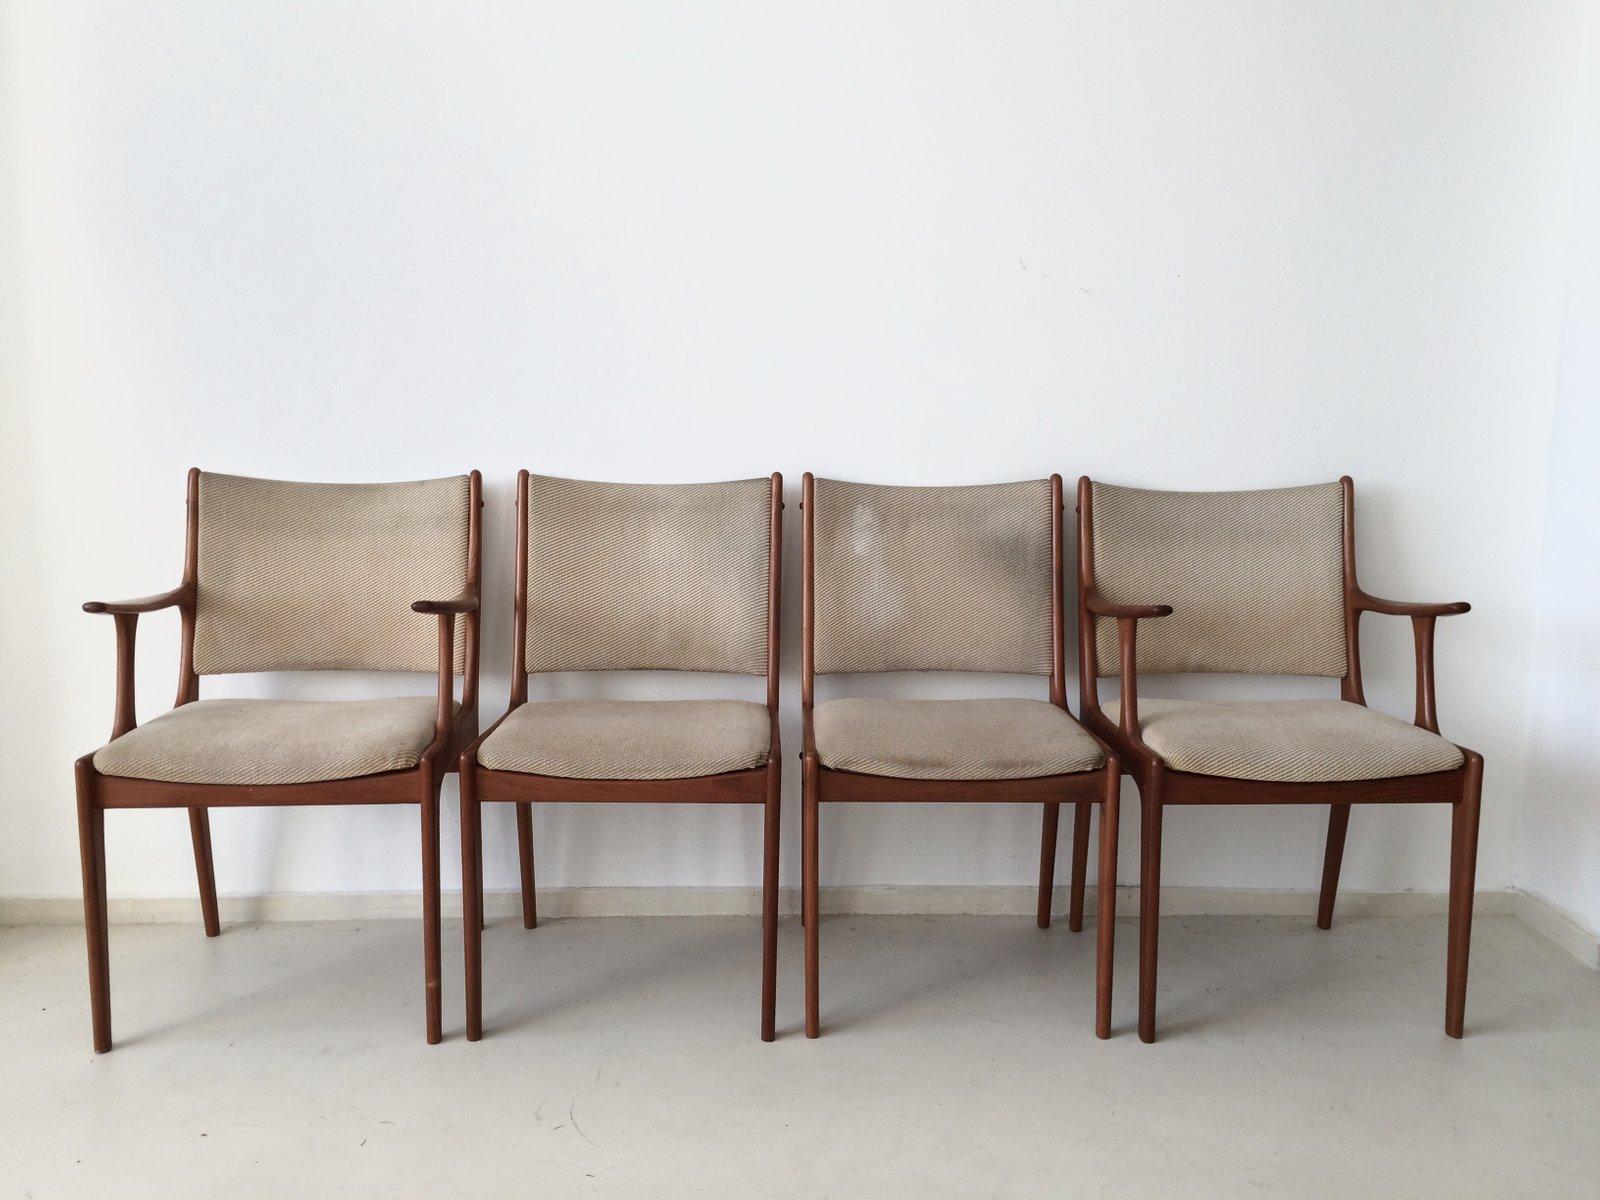 Teak Dining Chairs By Johannes Andersen For Uldum Mobelfabrik Set Of 4 Sale At Pamono